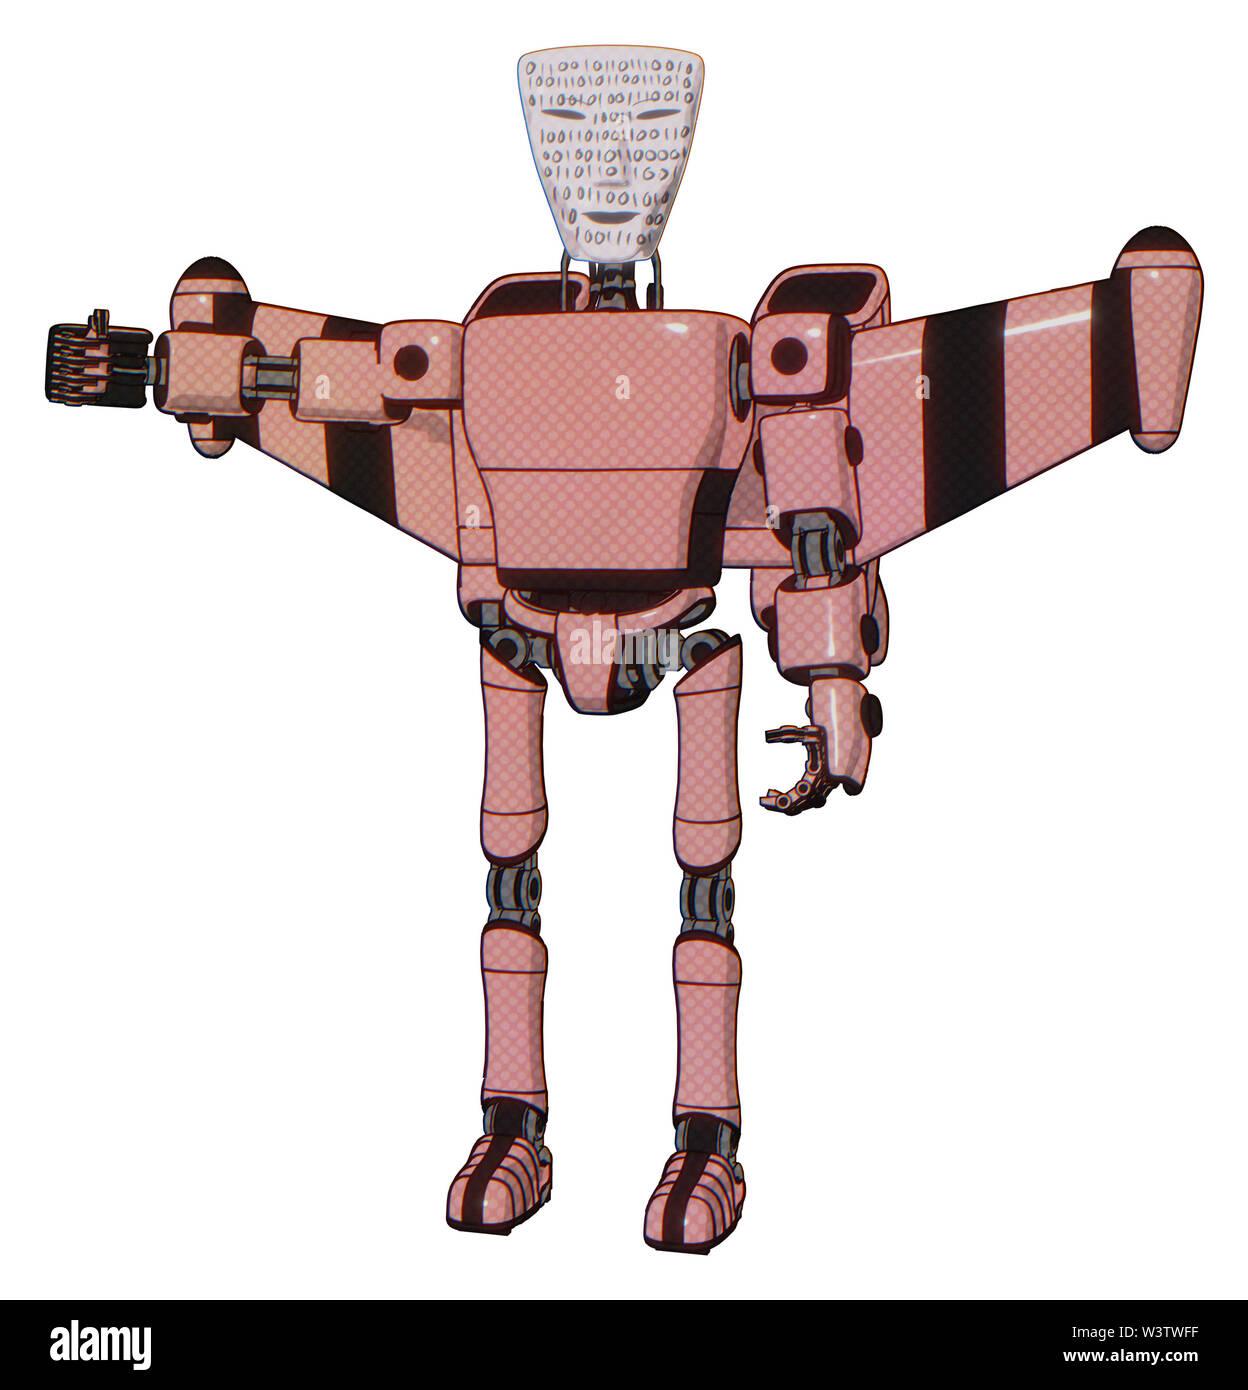 Cyborg containing elements: humanoid face mask, binary war paint, light chest exoshielding, prototype exoplate chest, stellar jet wing rocket pack, ul - Stock Image